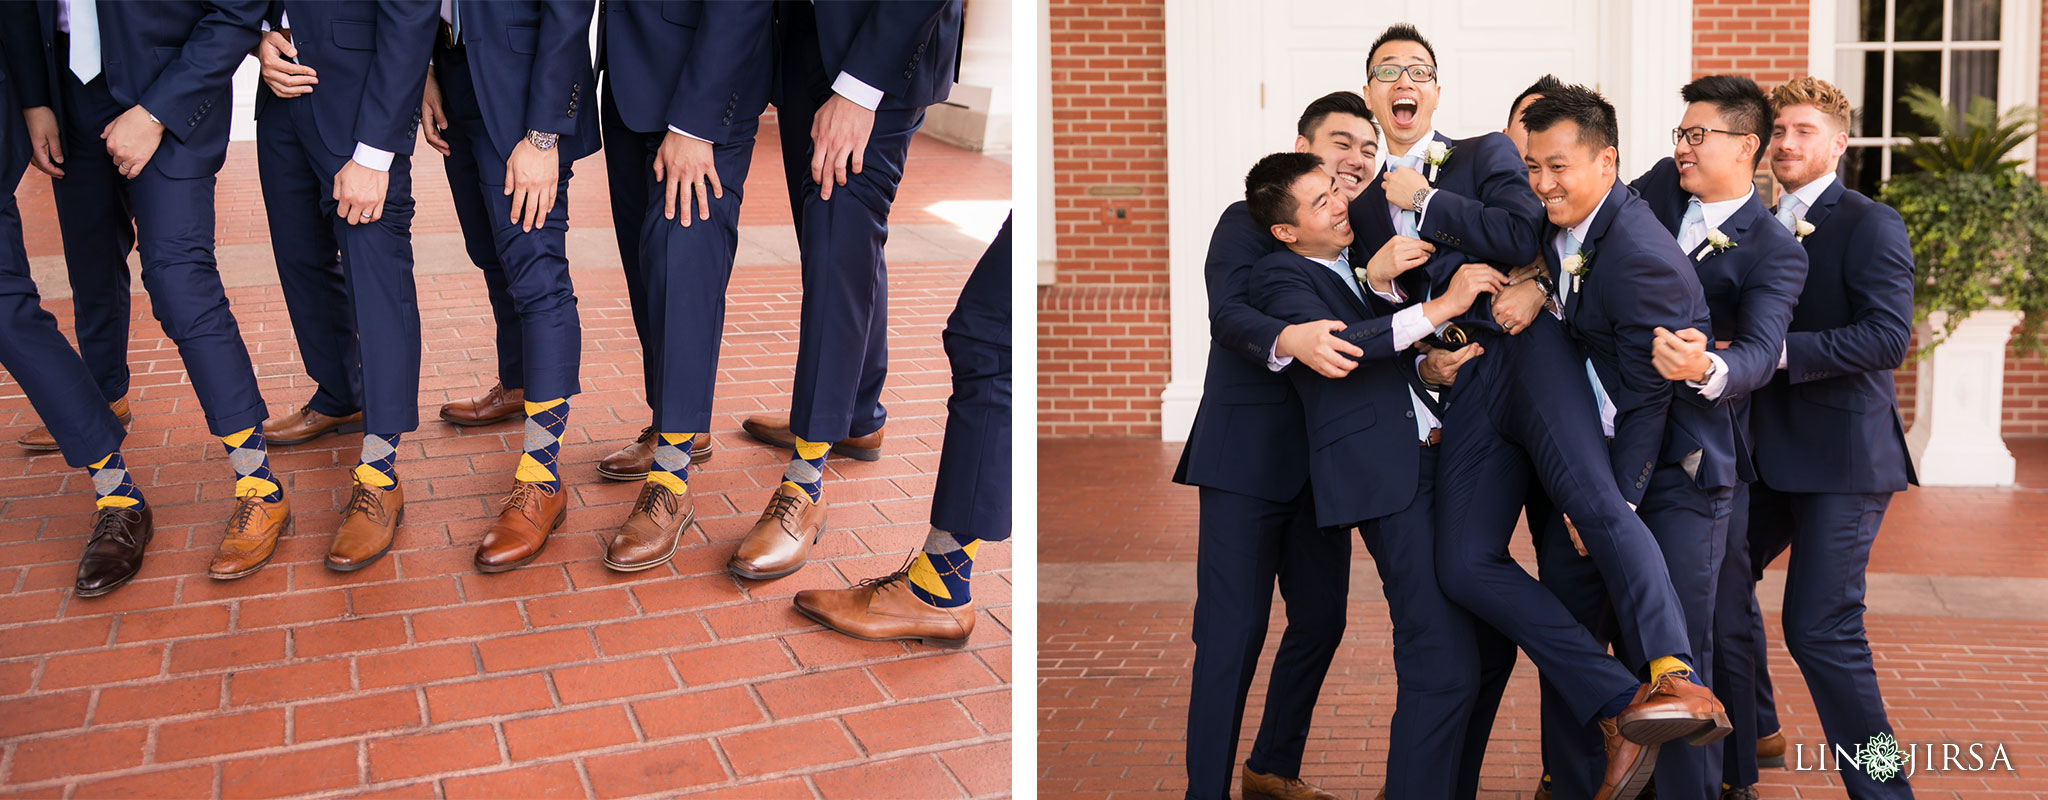 011 sherwood country club ventura county groomsmen wedding photography